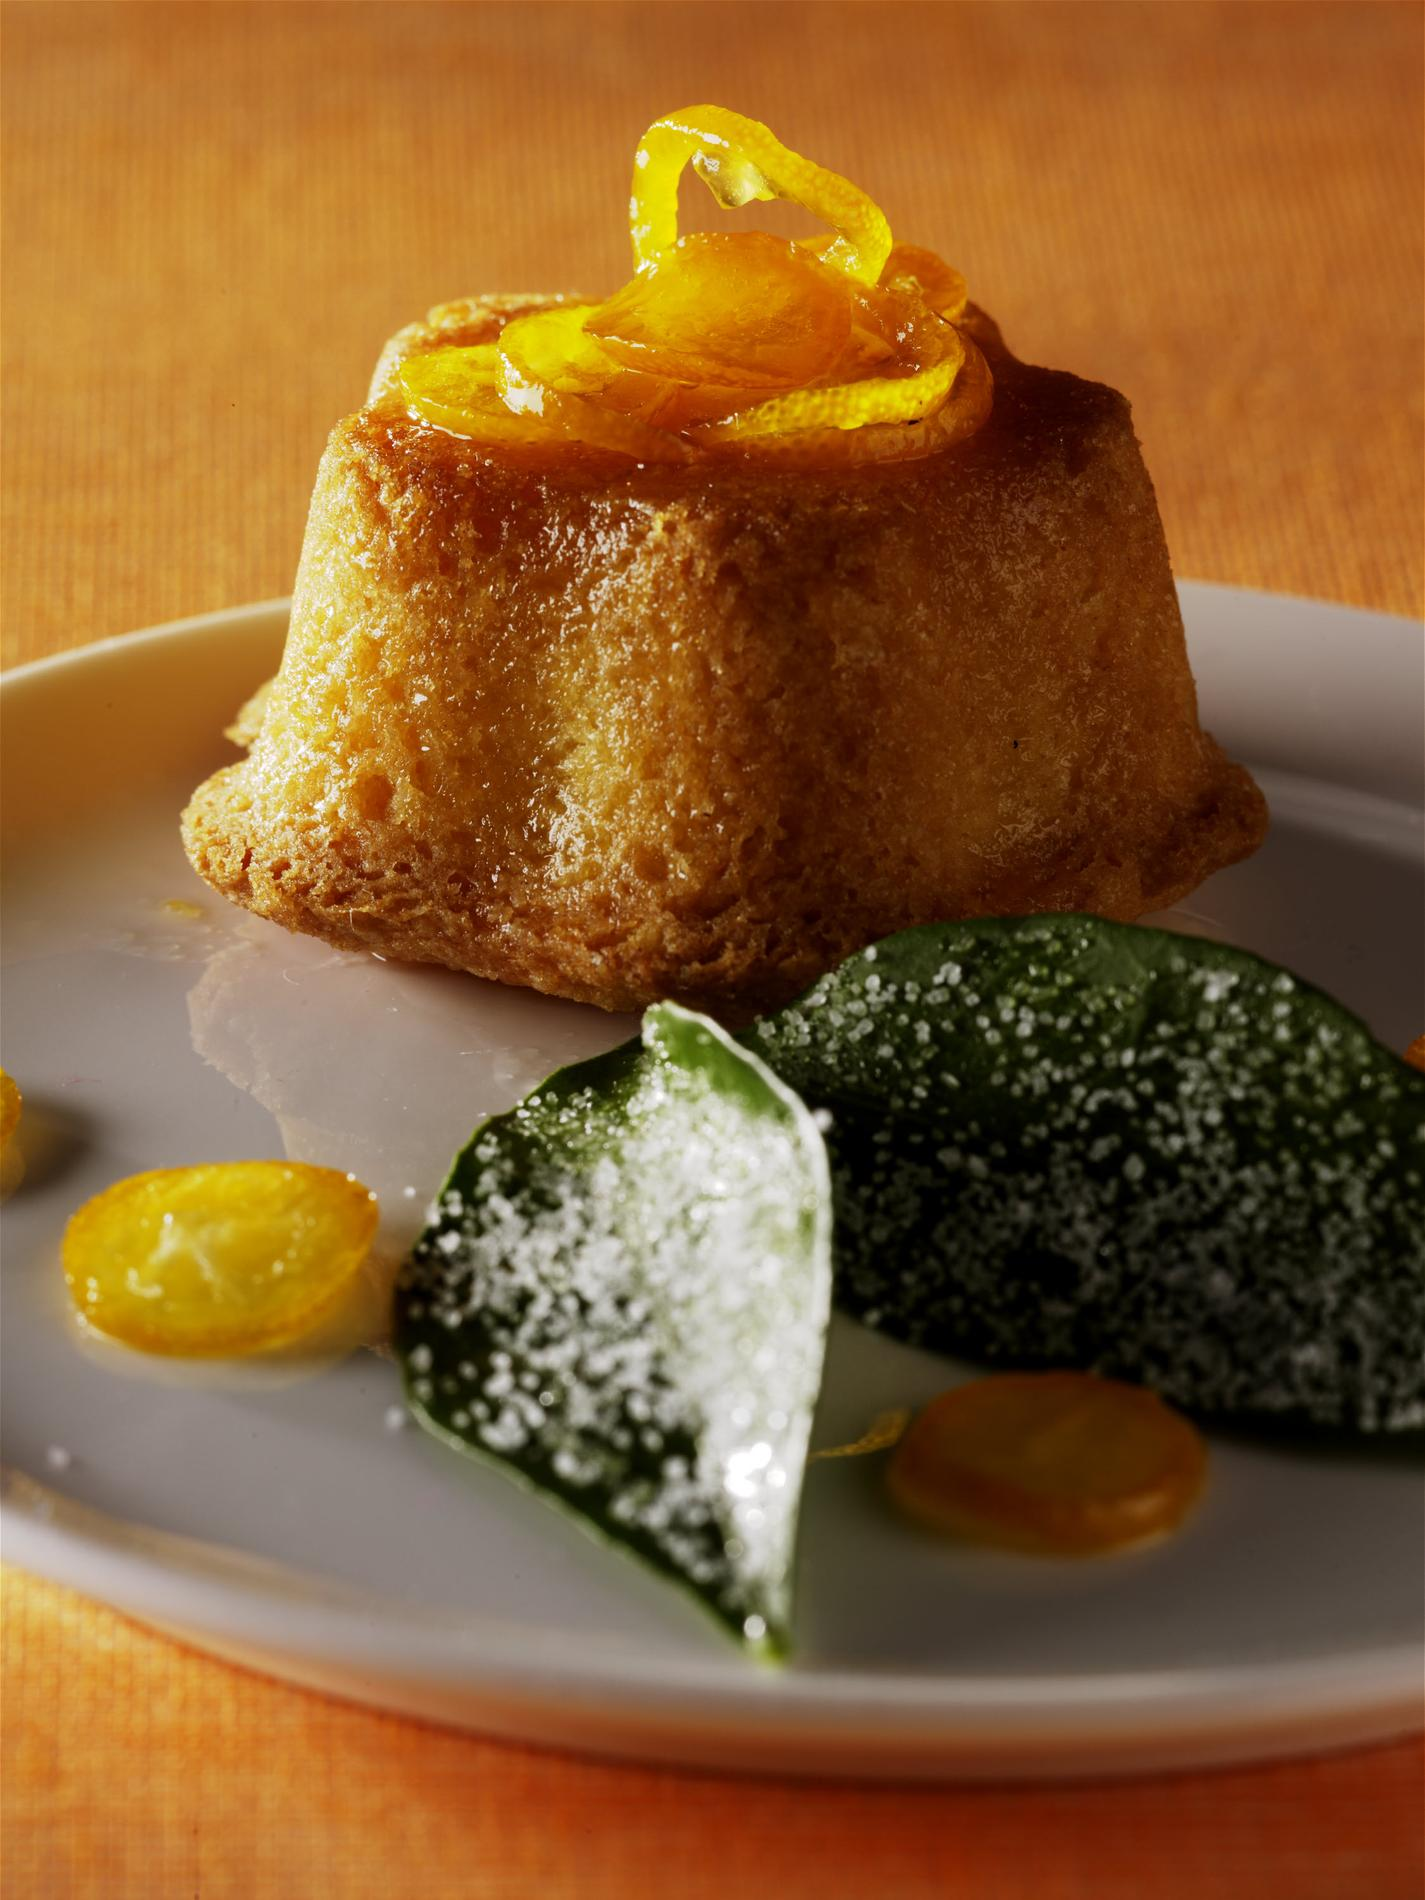 recette cake au citron et kumquats cuisine madame figaro. Black Bedroom Furniture Sets. Home Design Ideas